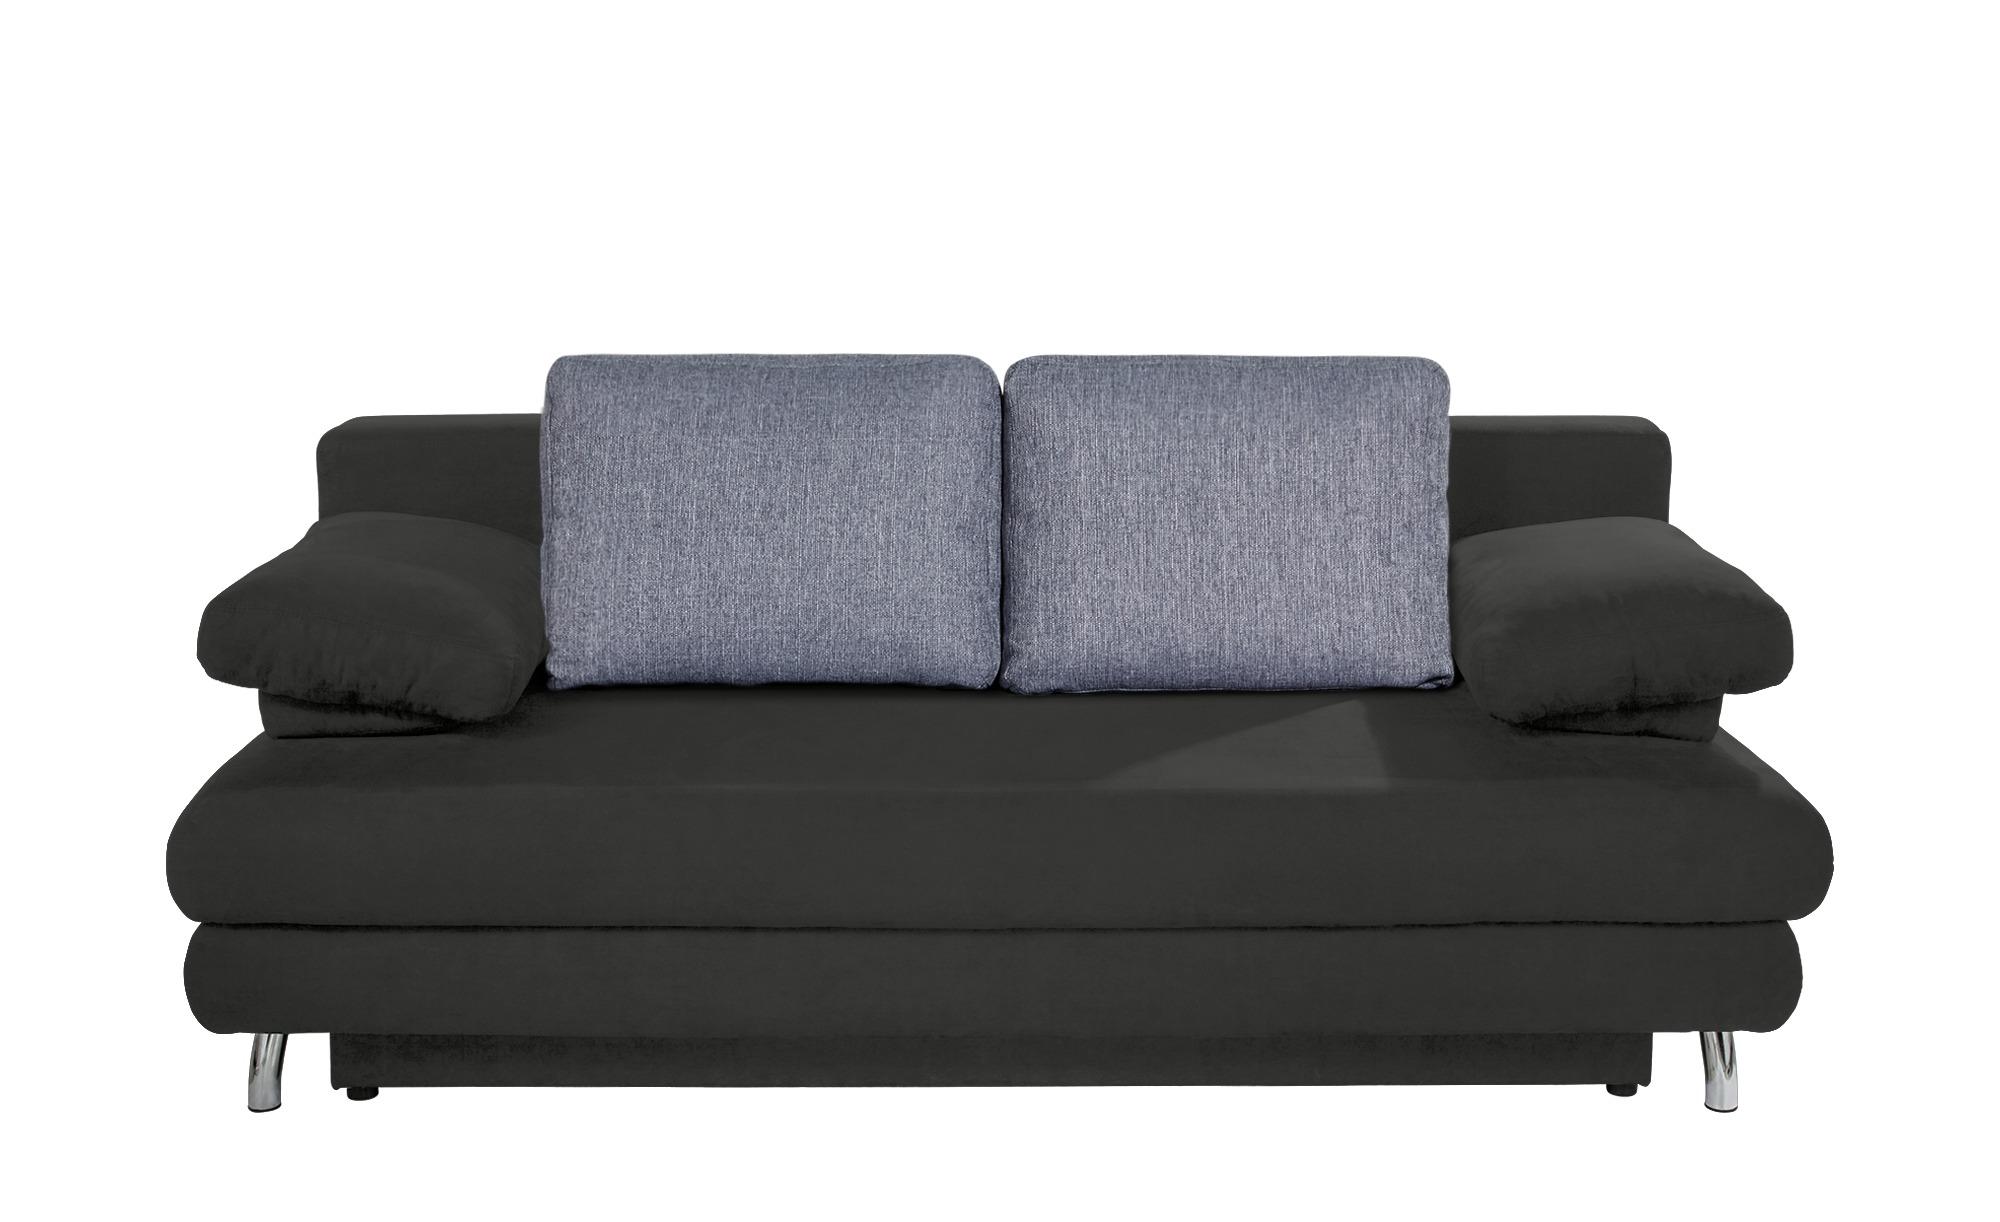 Schlafsofa grau - Webstoff Calina ¦ grau ¦ Maße (cm): B: 205 H: 80 T: 100 Polstermöbel > Sofas > 2-Sitzer - Höffner